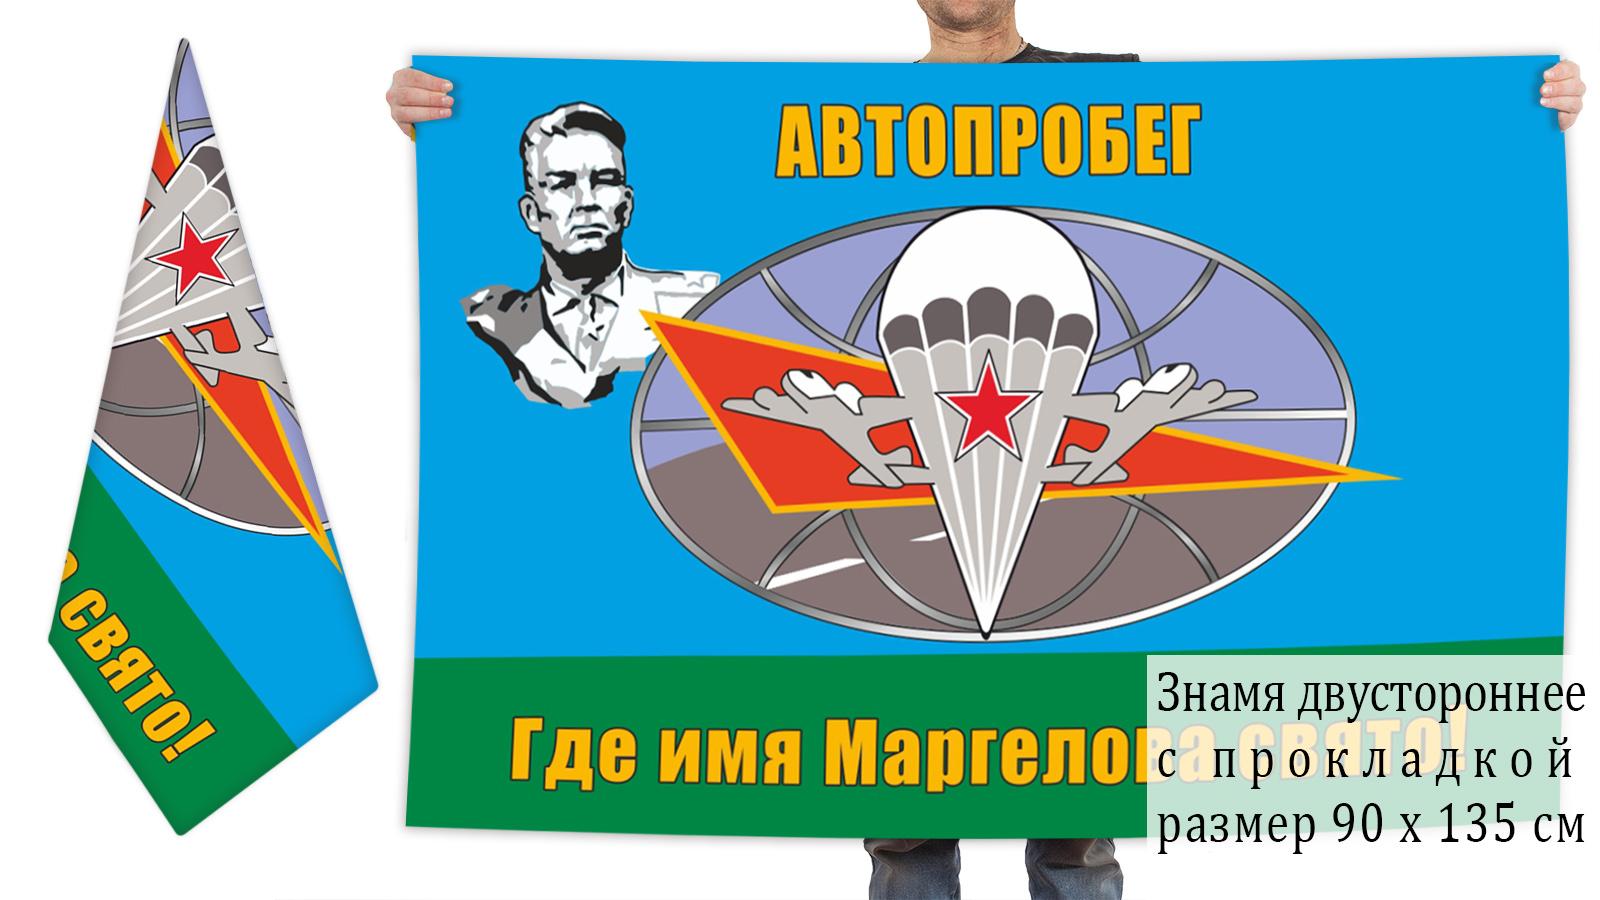 Двусторонний флаг Автопробега ко дню рождения генерала Маргелова